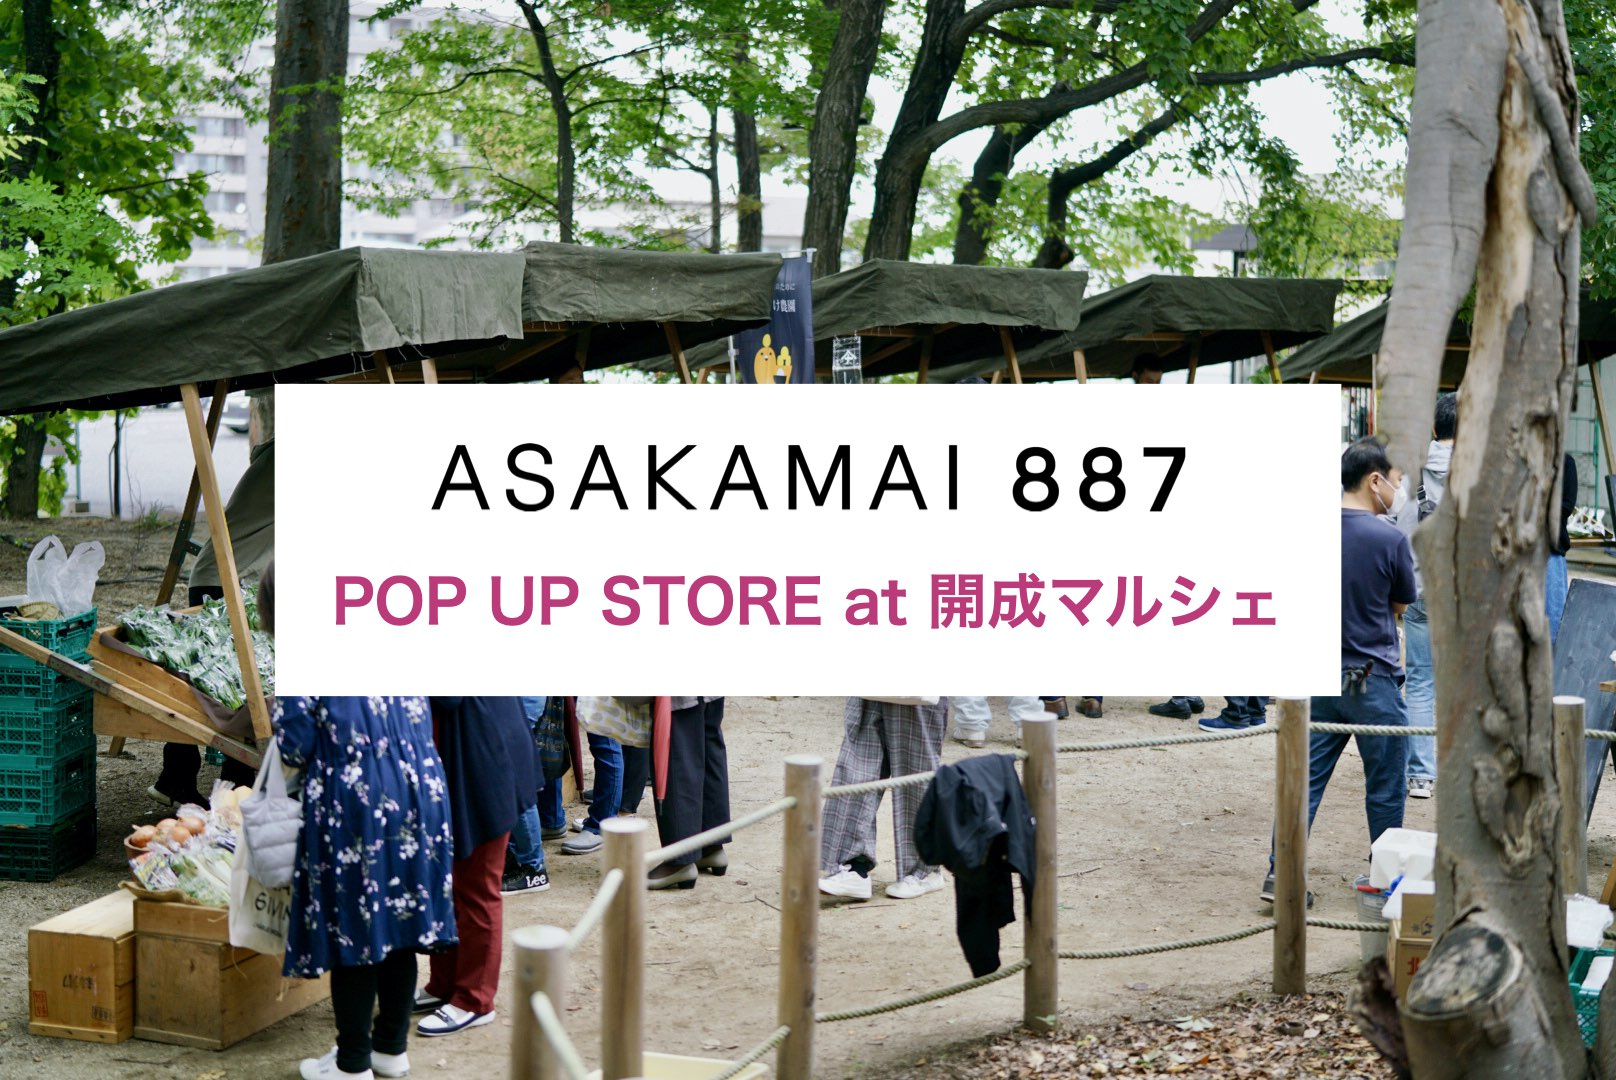 POP UP STORE at 開成マルシェ